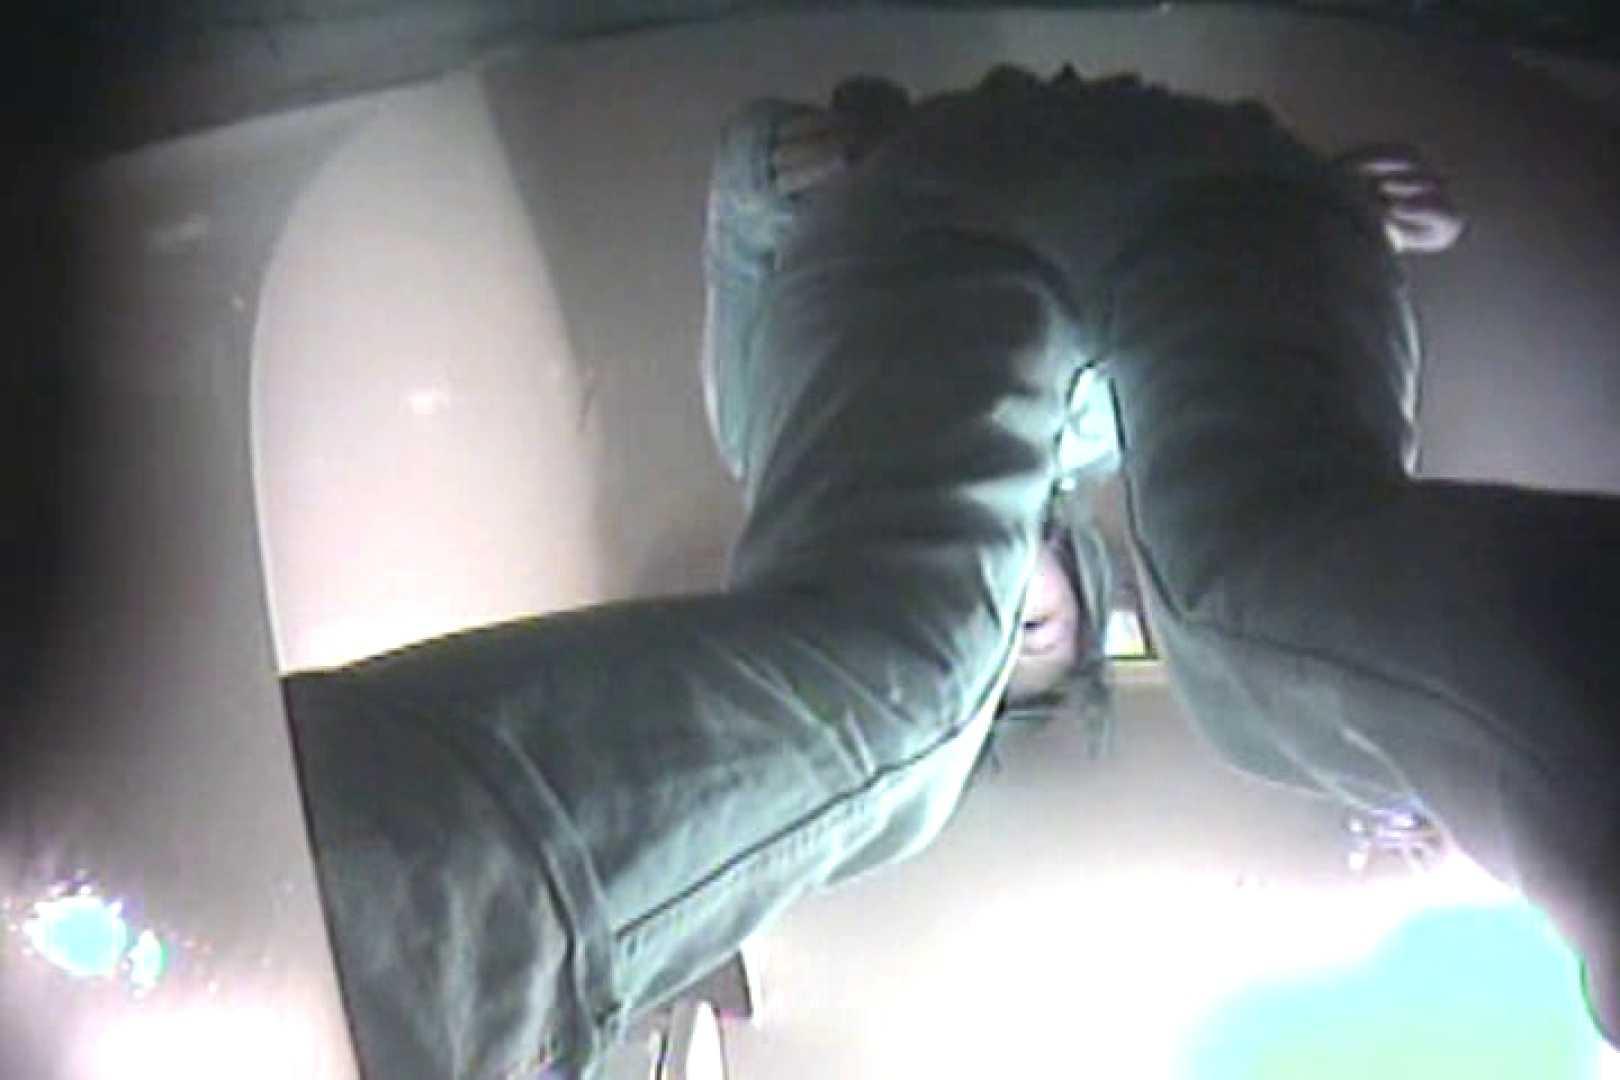 [お盆限定]和式洗面所汚物フレフレ100連発 Vol.1 美女OL 性交動画流出 52連発 2